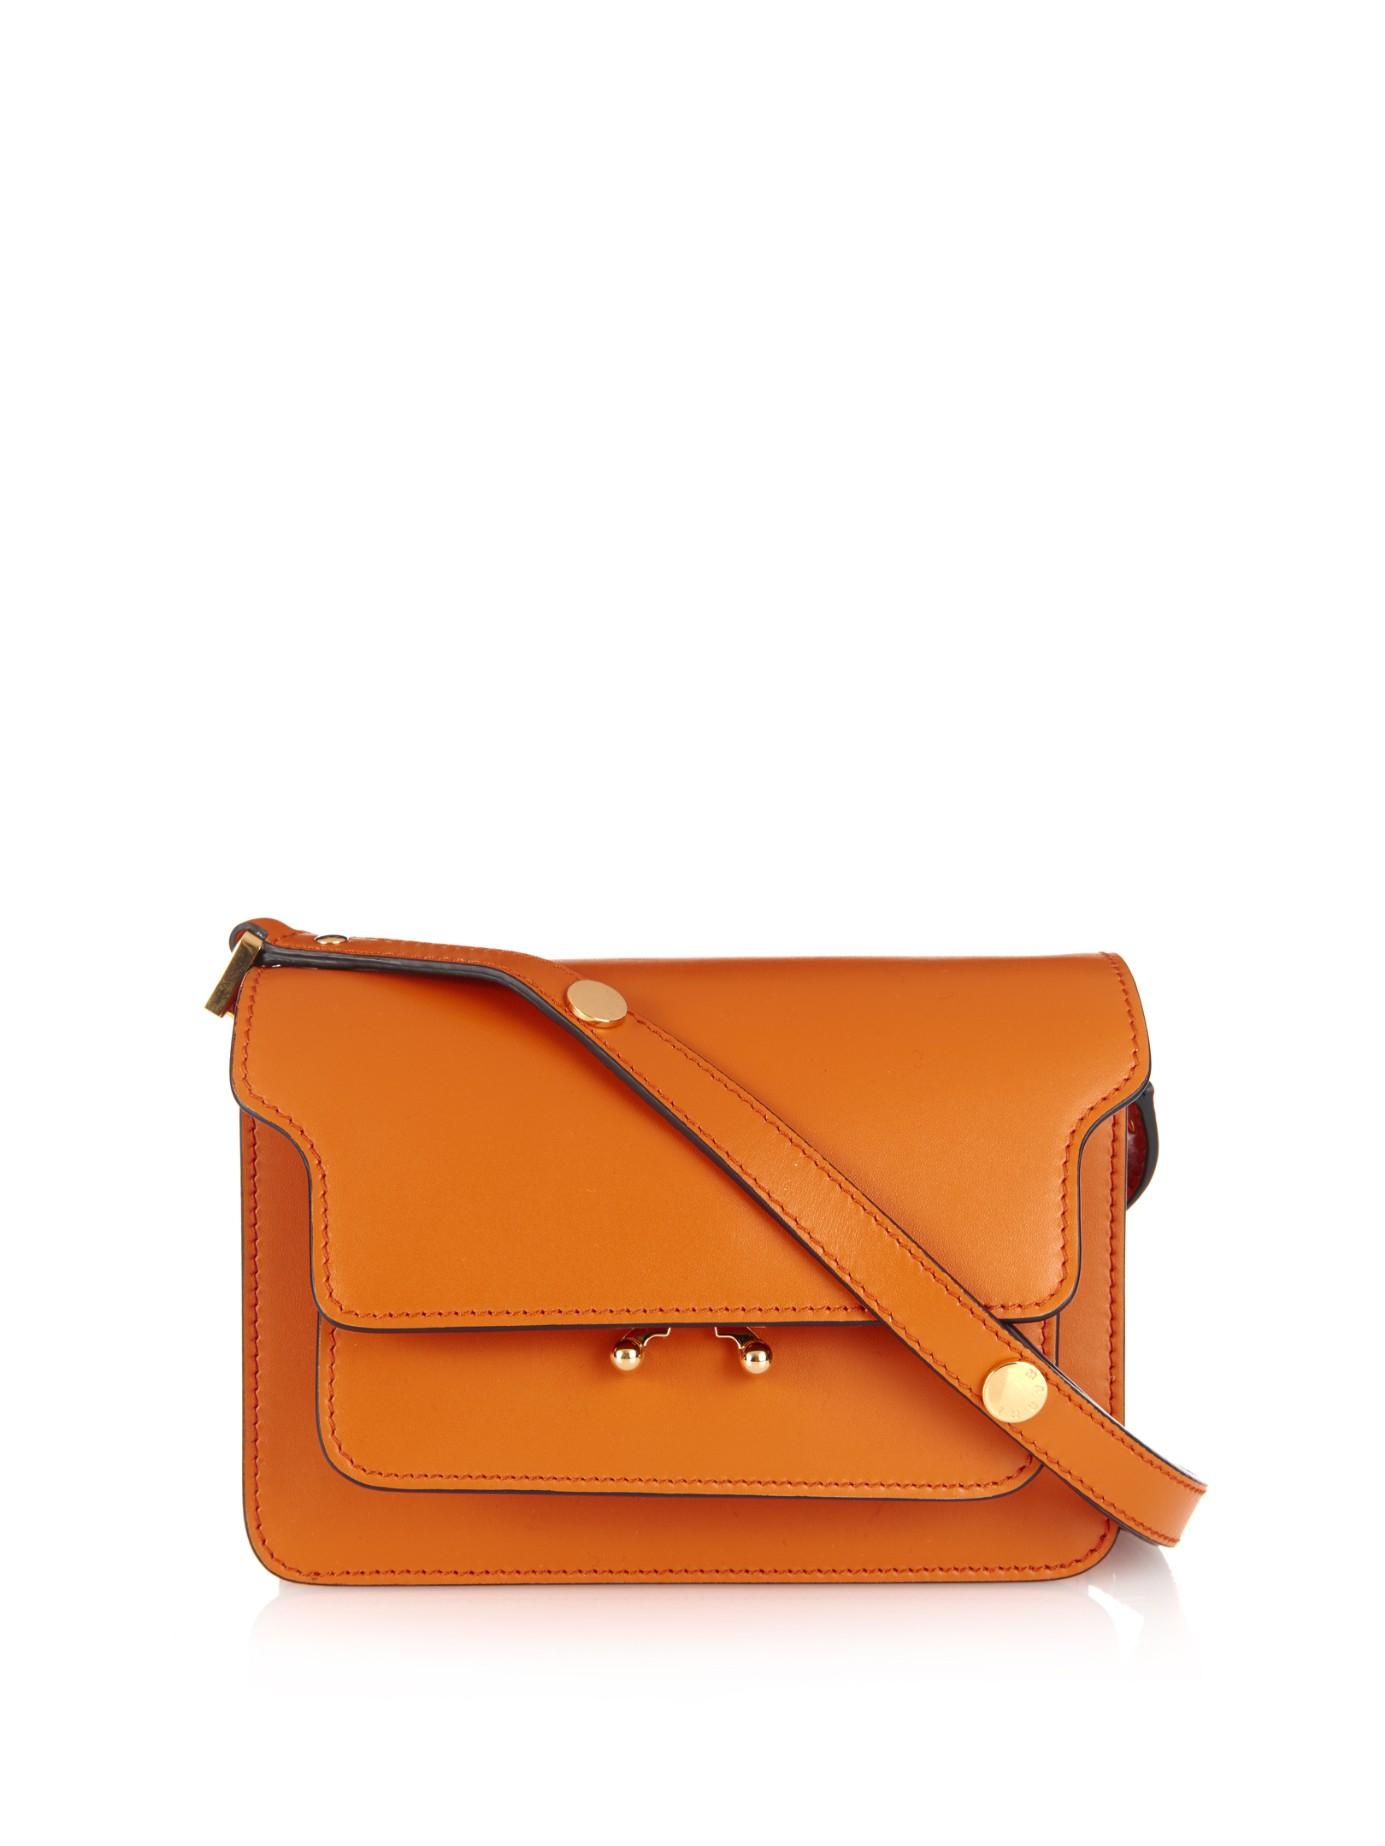 Marni Trunk Mini Leather Shoulder Bag in Orange | Lyst